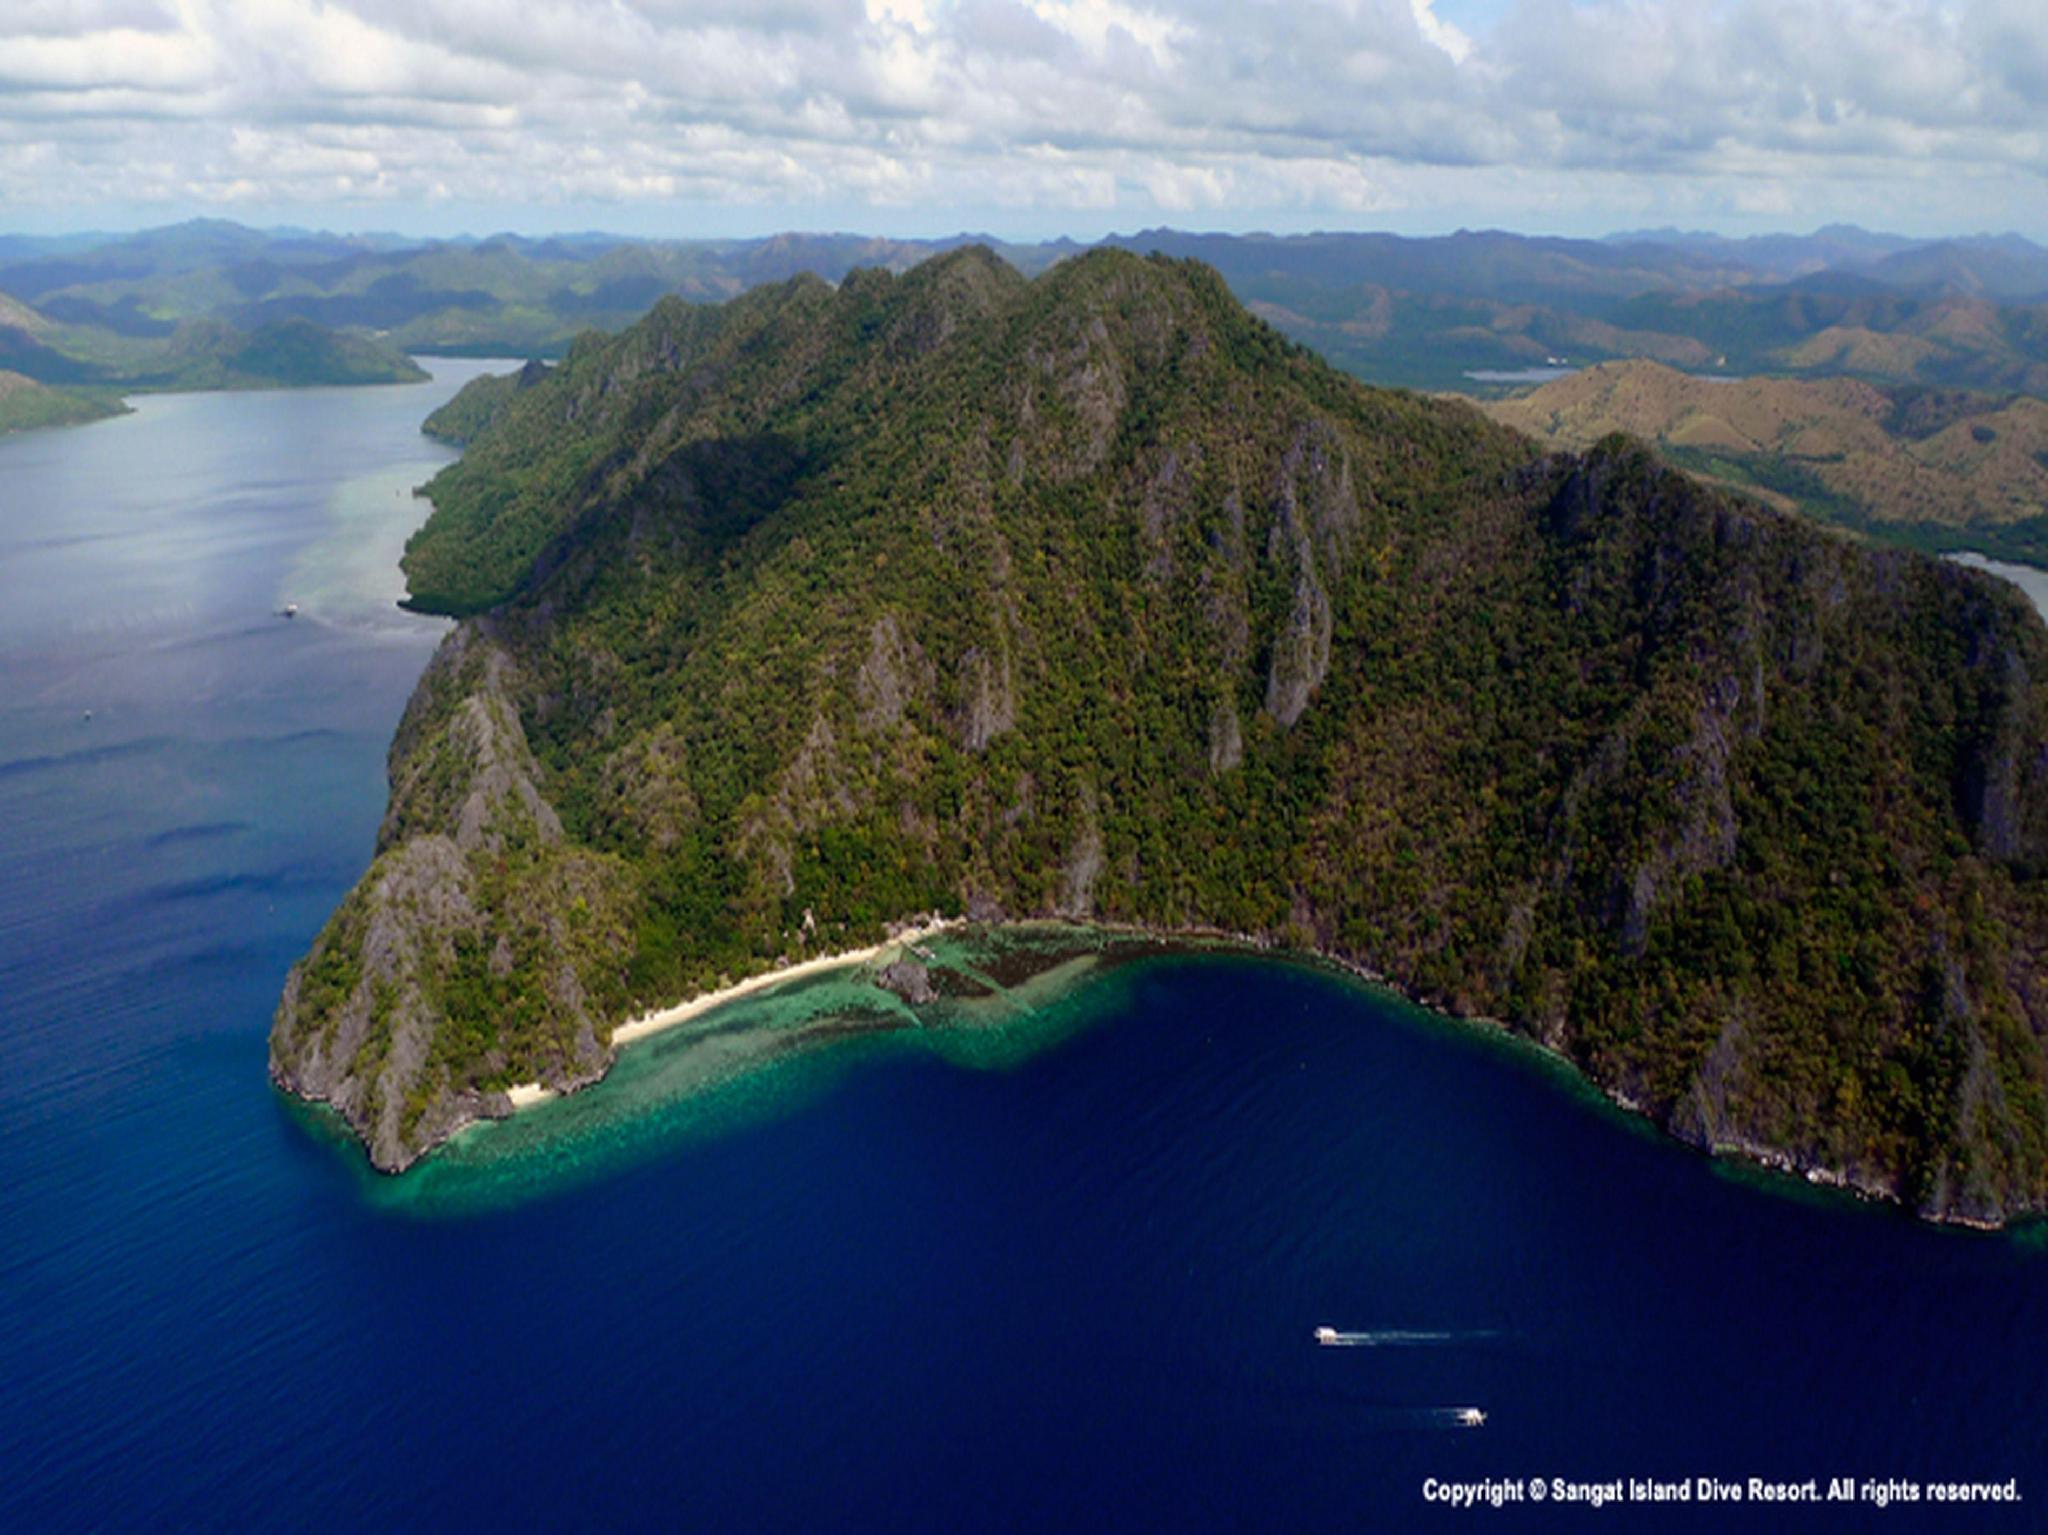 Sangat Island Dive Resort